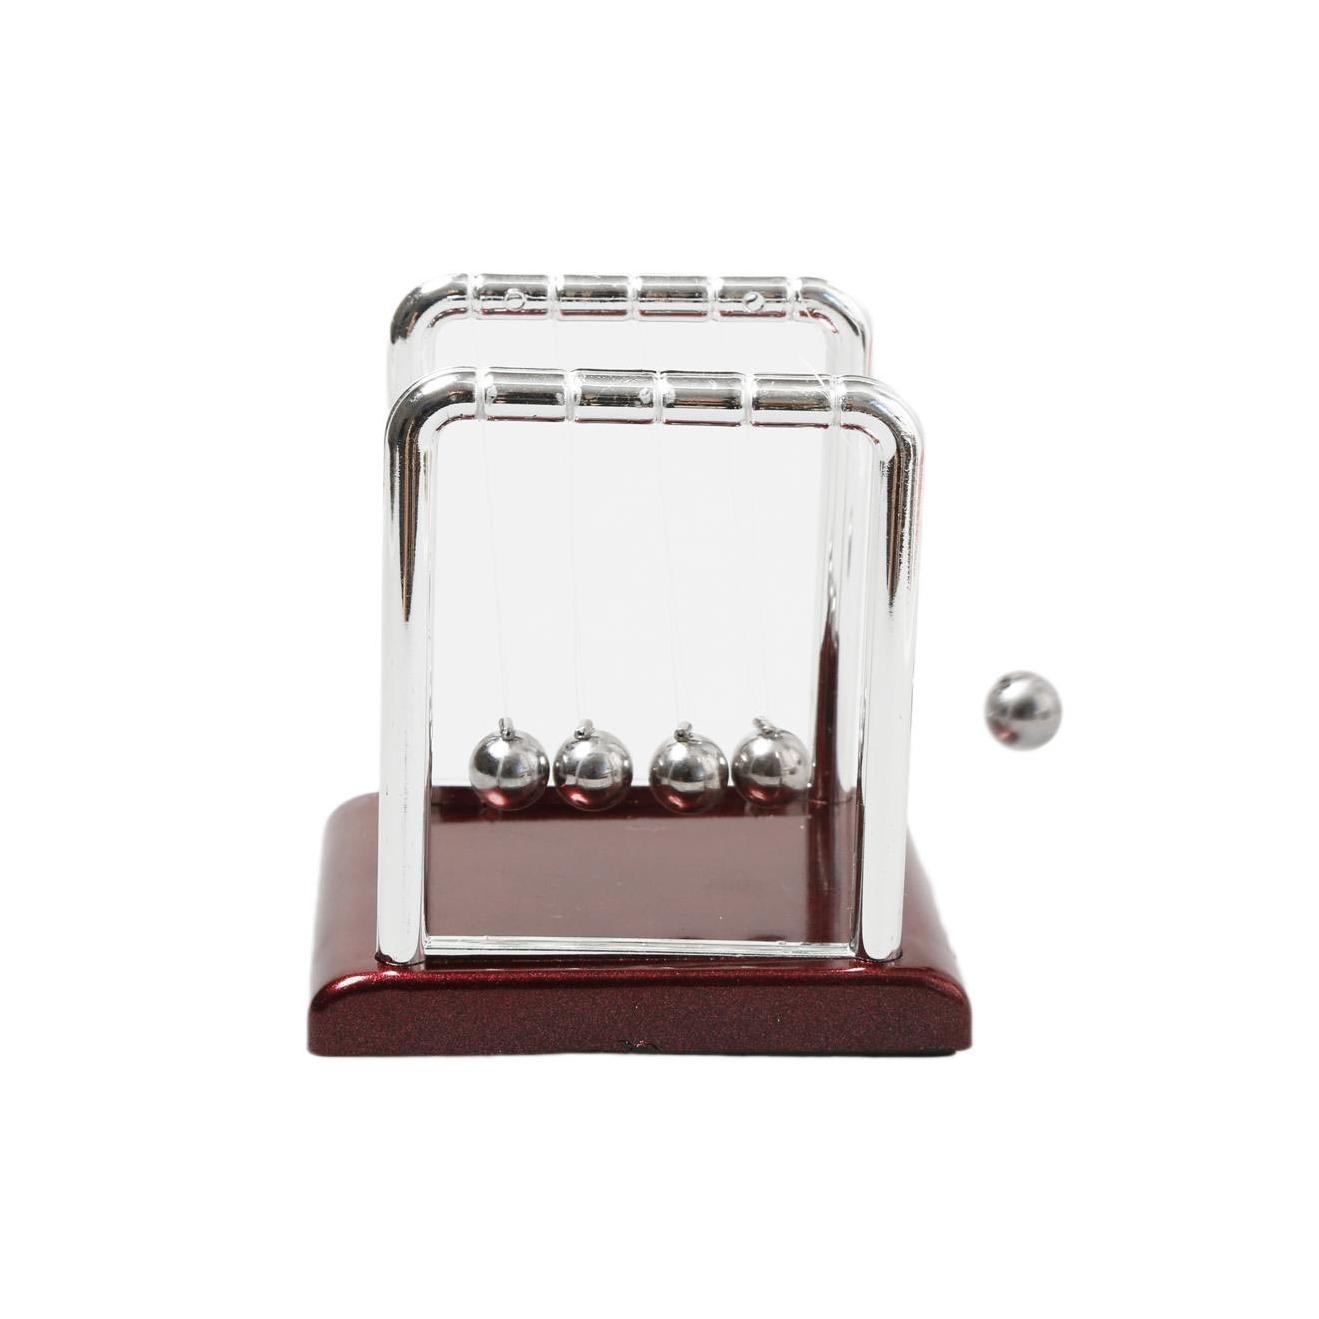 Pajangan Meja Pendulum Unik Keren Newton Size S